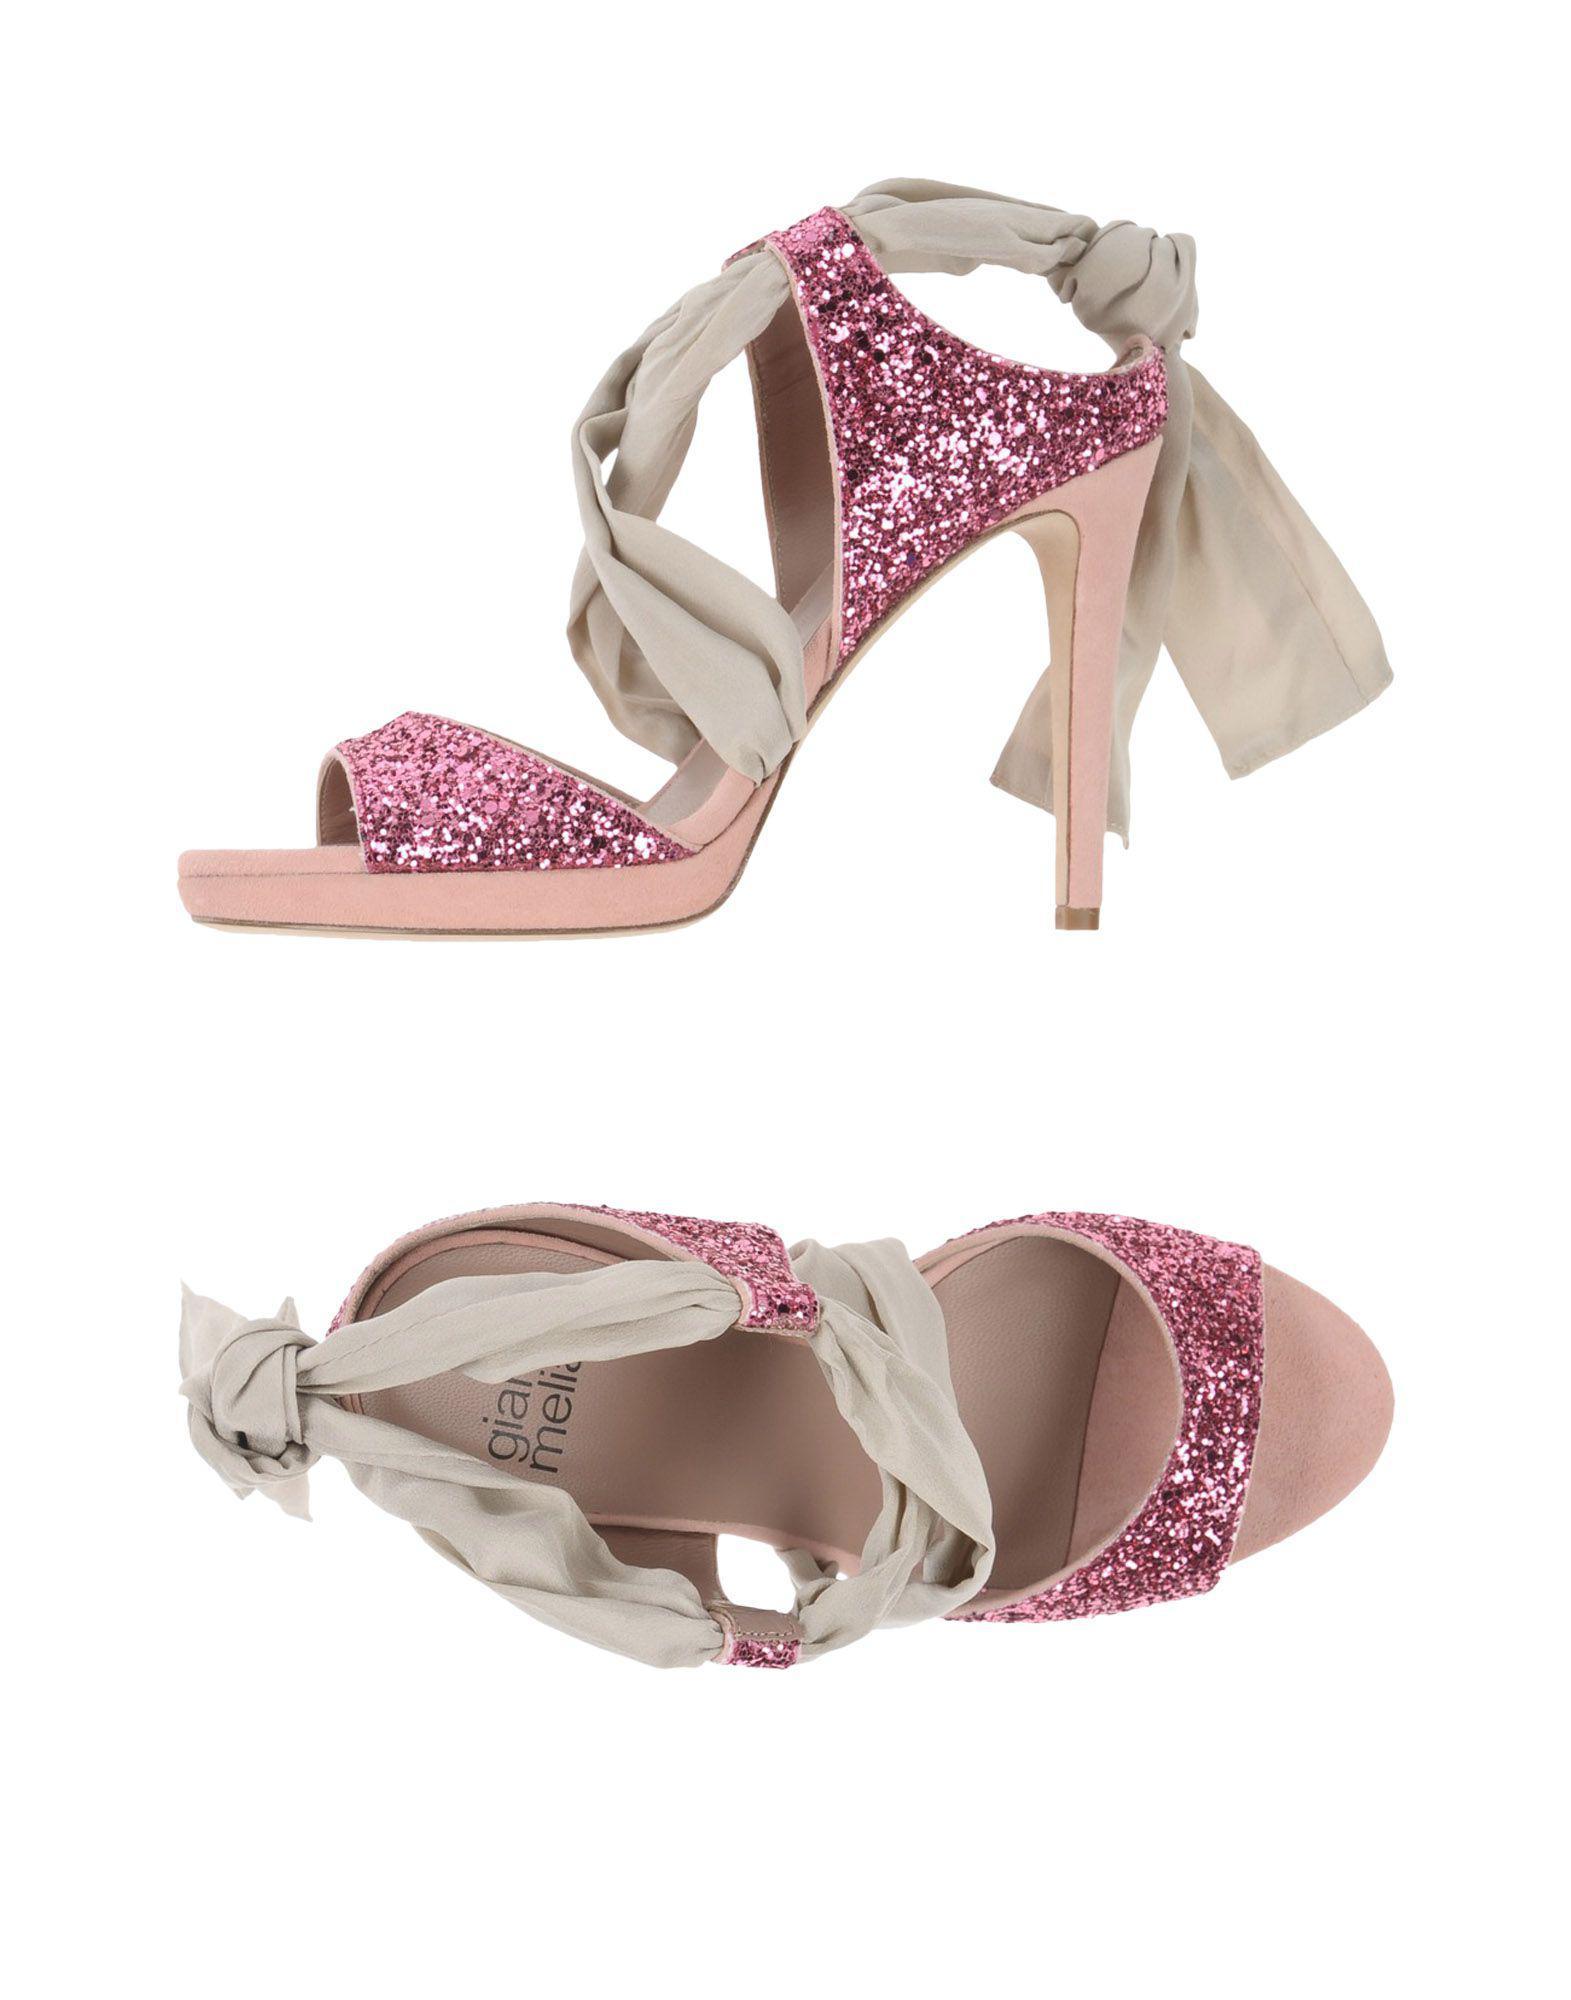 Gianna Meliani Shoes Price